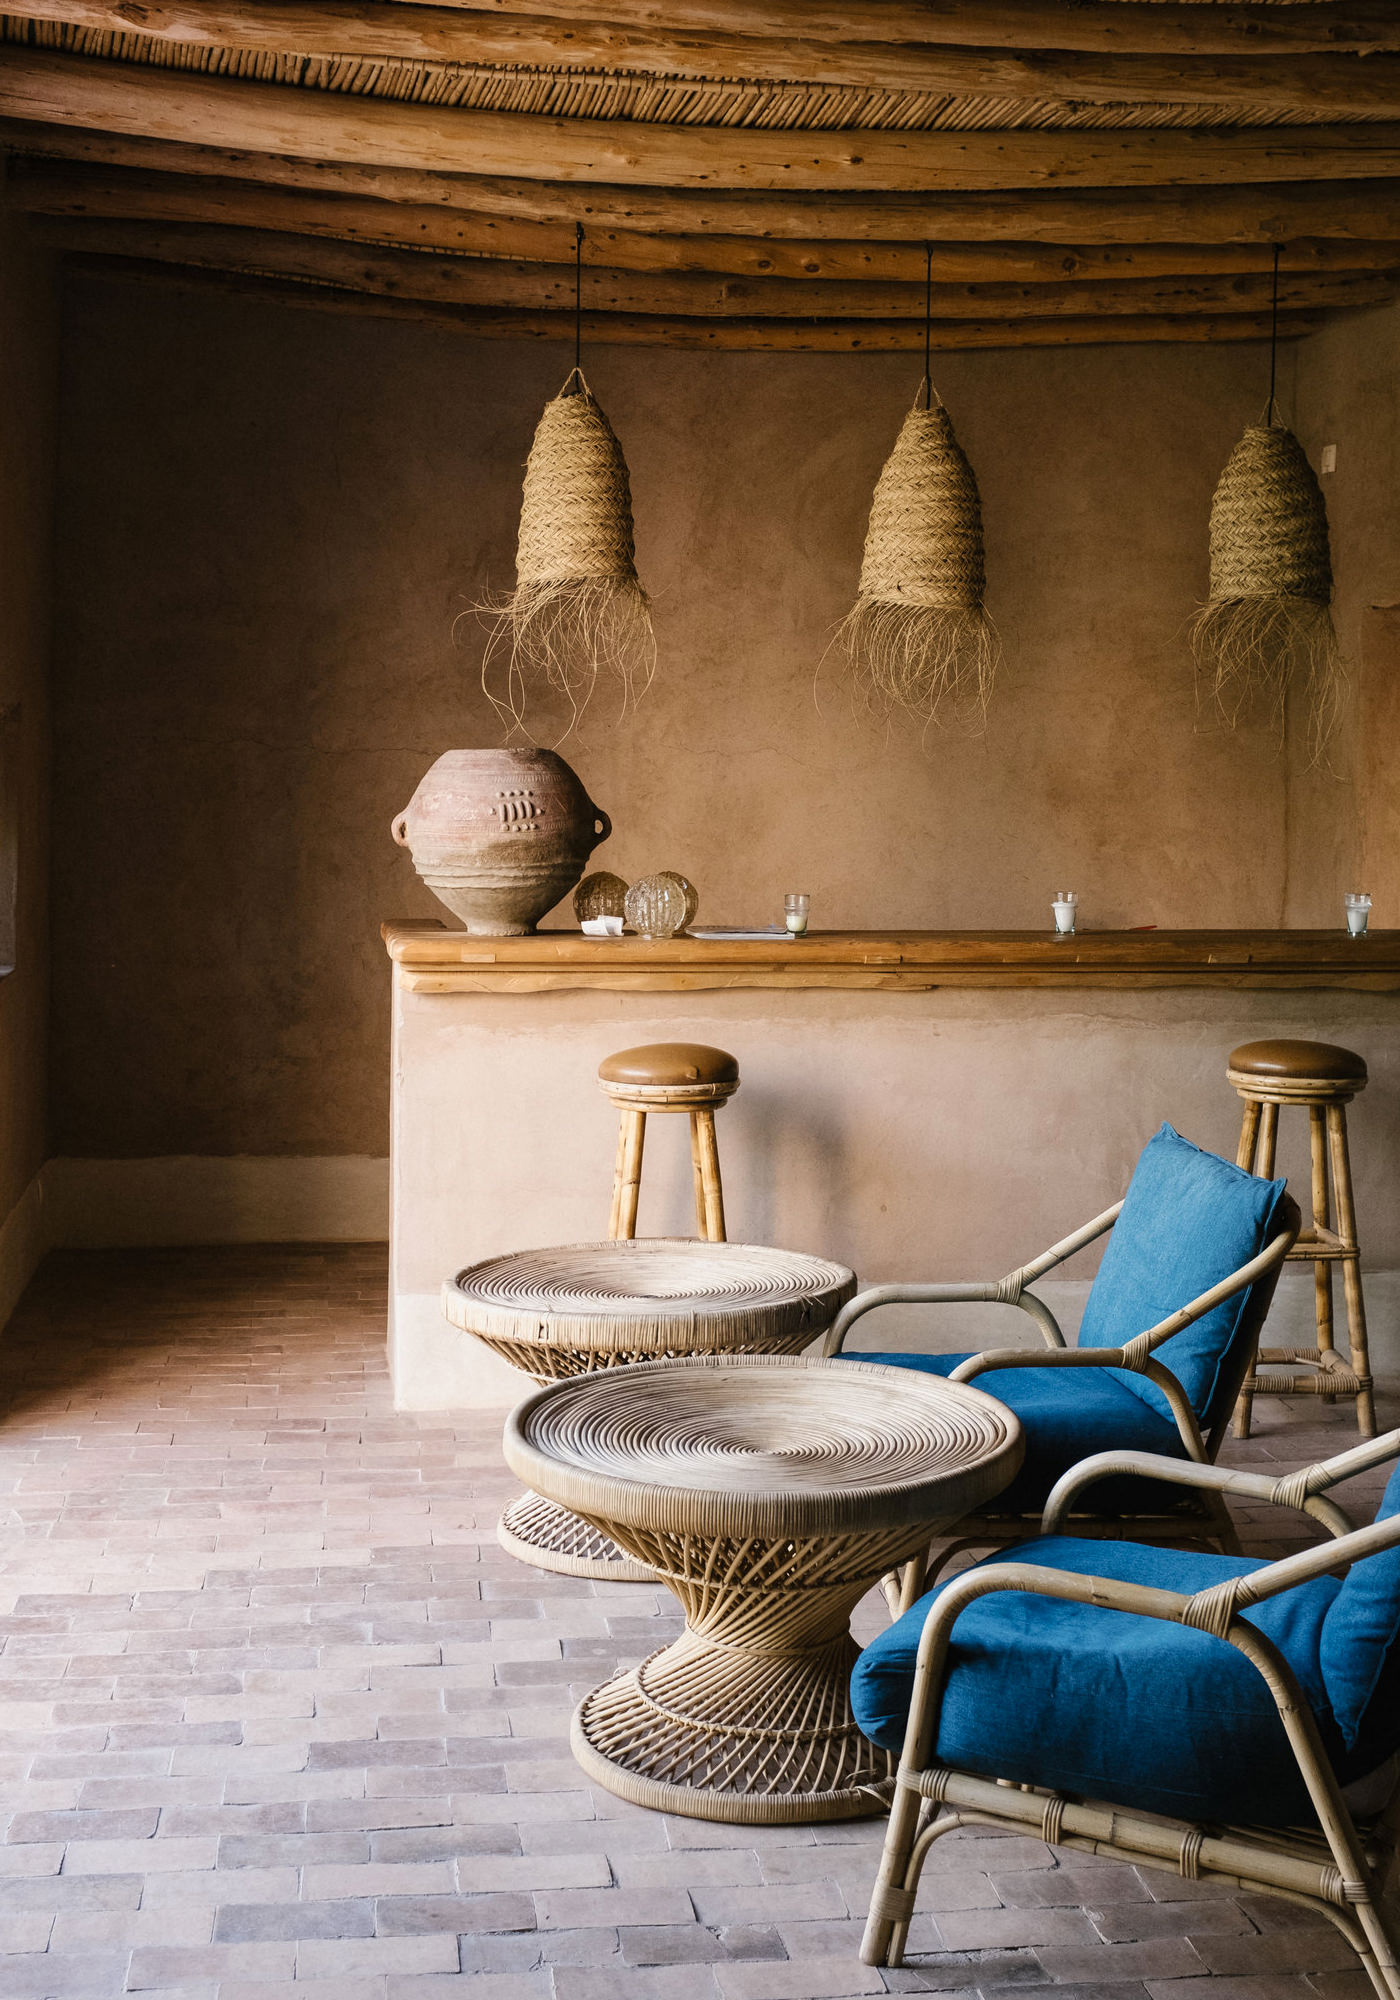 Berber Lodge Hotel Maison Oumnas Maroc Bar